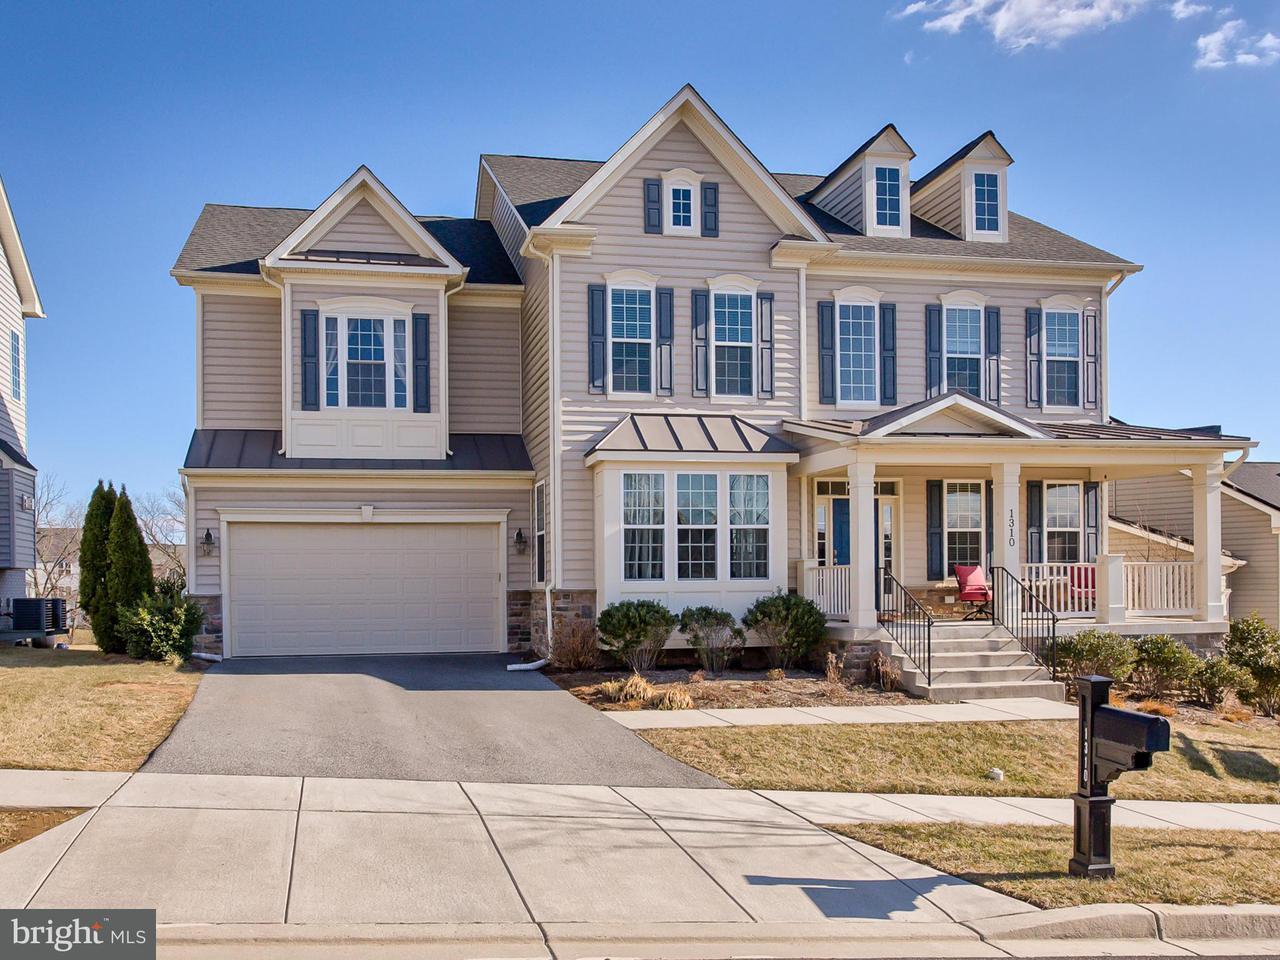 Casa Unifamiliar por un Venta en 1310 Hope Farm Court 1310 Hope Farm Court Brunswick, Maryland 21716 Estados Unidos